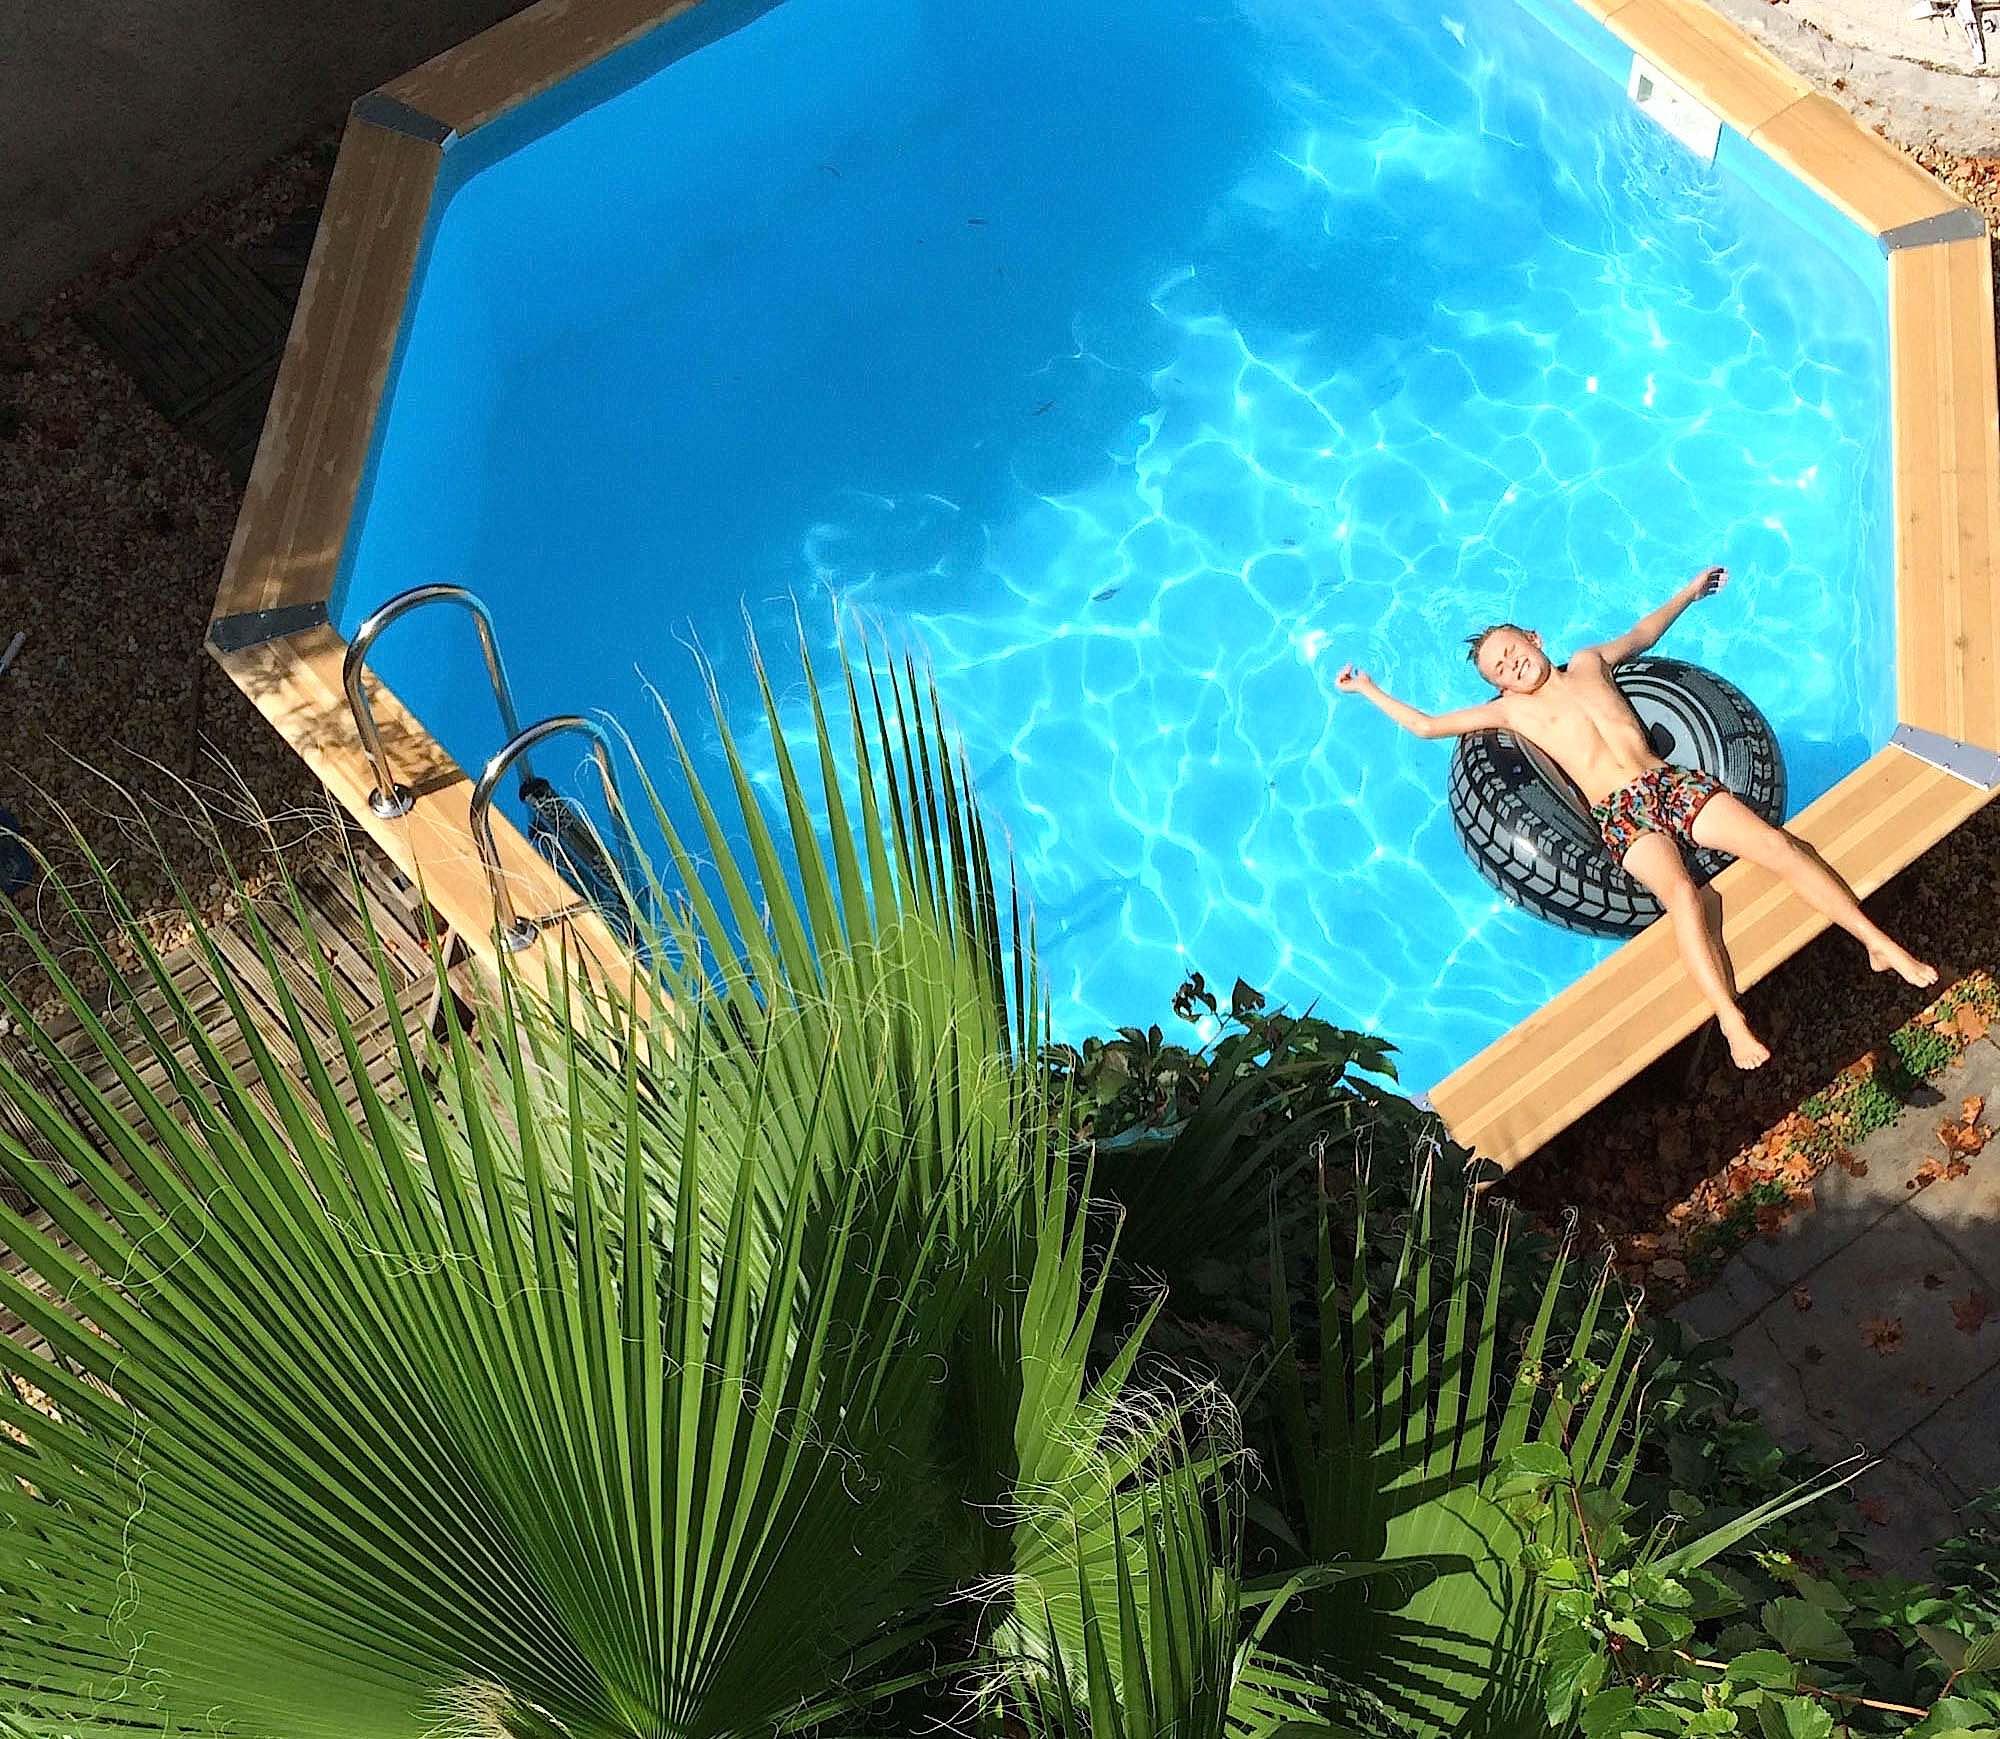 sid piscine recadrée